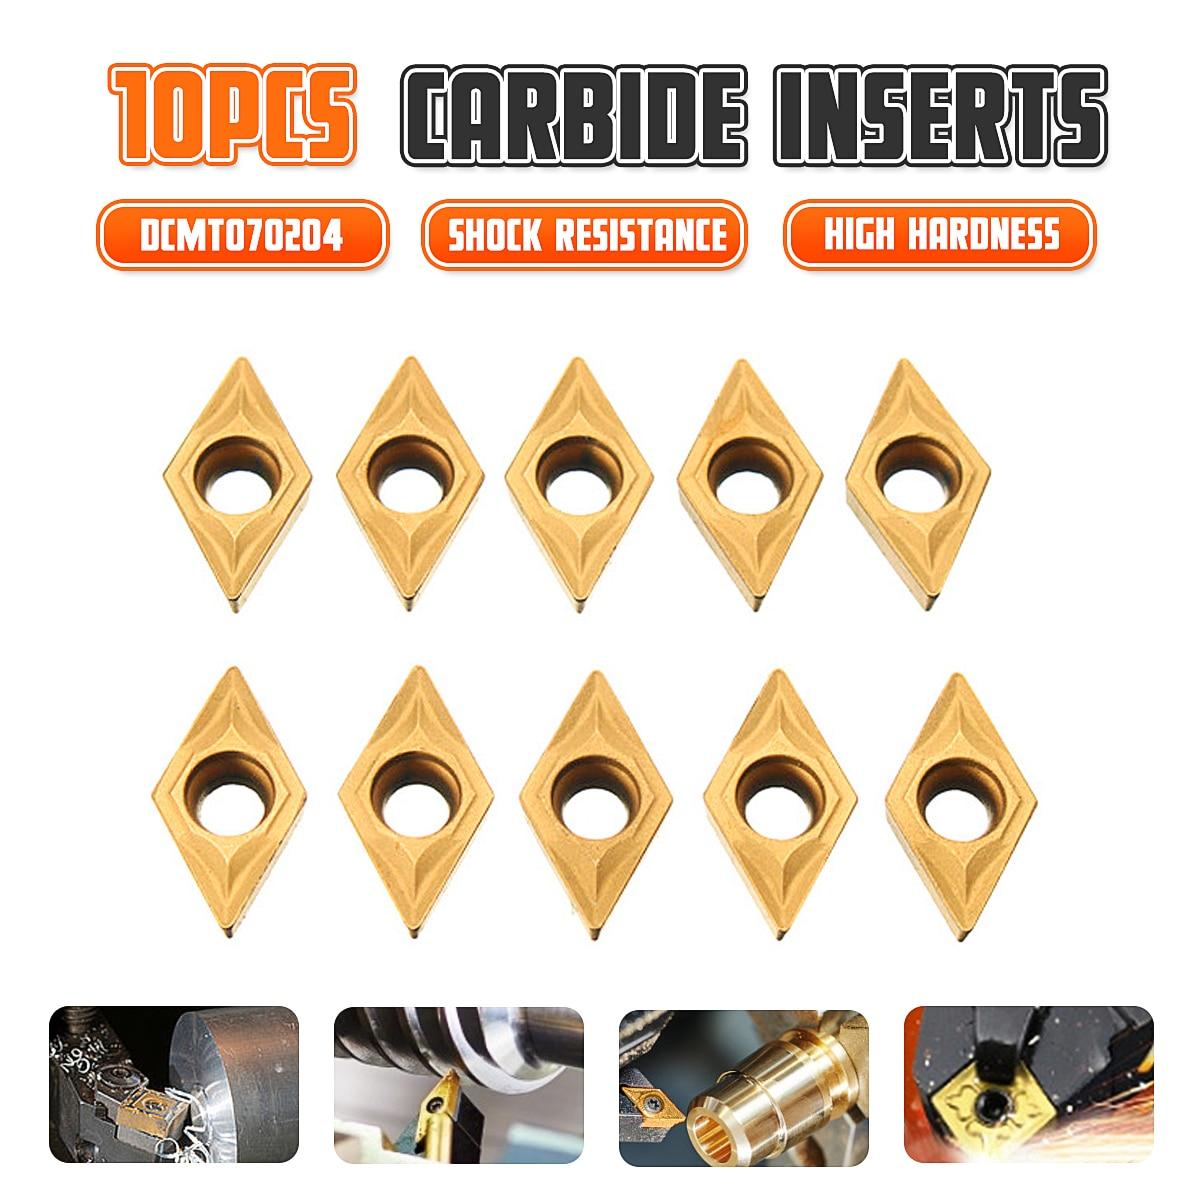 10PCS/Box DCMT070204 YBC251 Carbide Inserts For Lathe Turning Tool Boring Bar Hot Sale